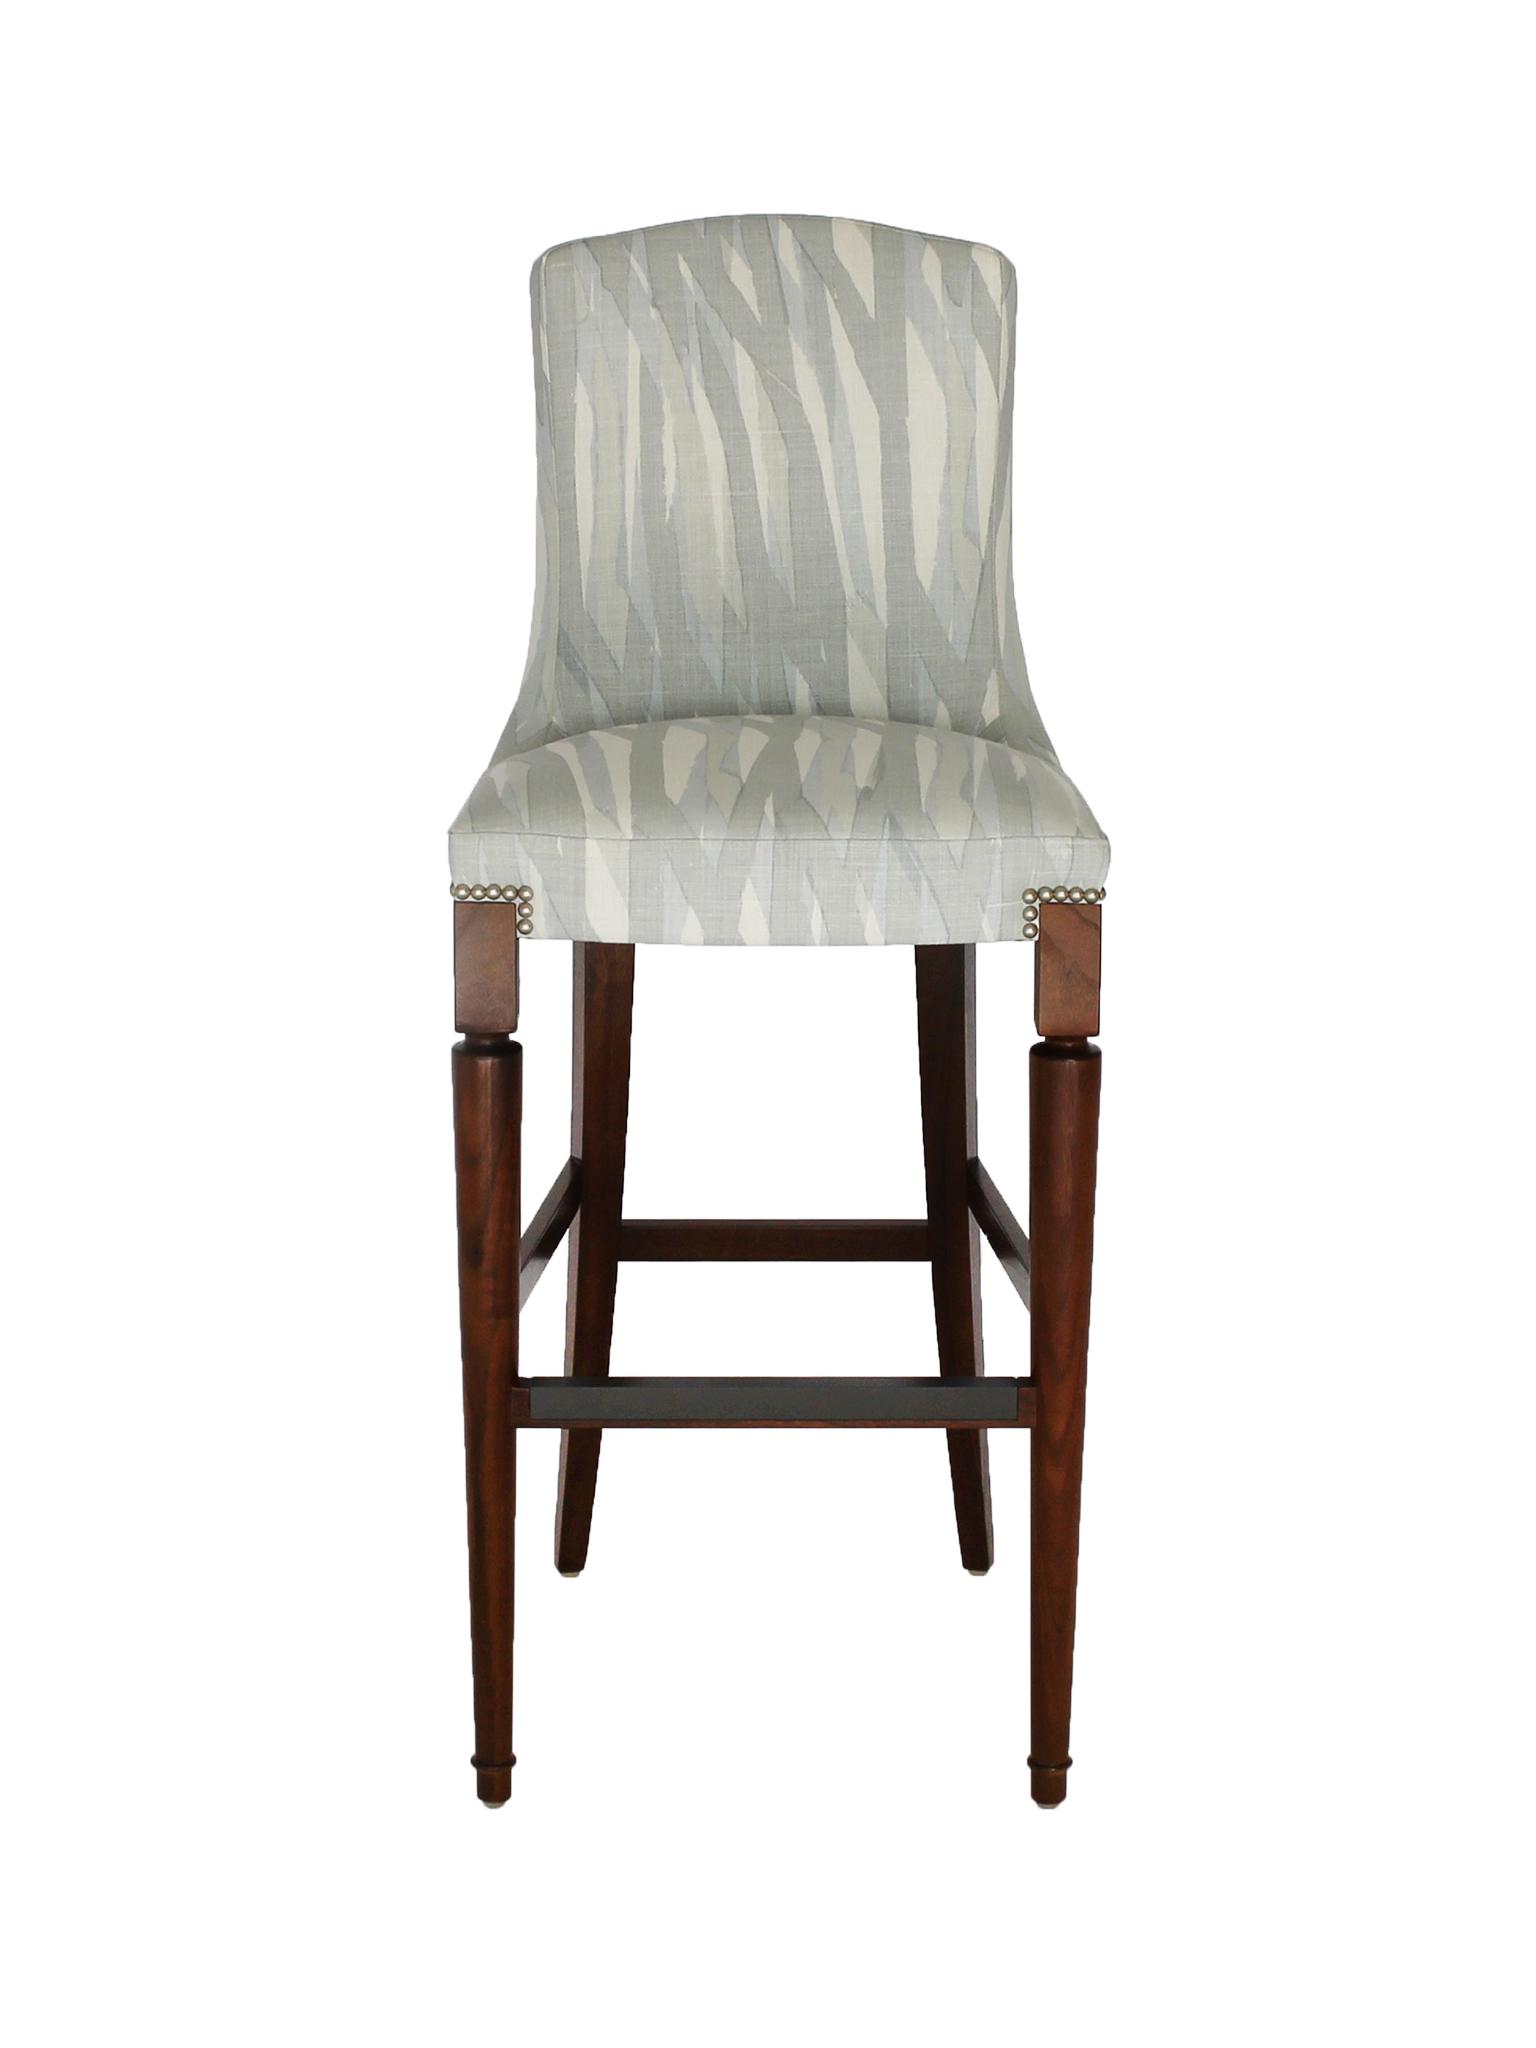 Phenomenal Delaware Barstool Counterstool By Holland Sherry Inzonedesignstudio Interior Chair Design Inzonedesignstudiocom